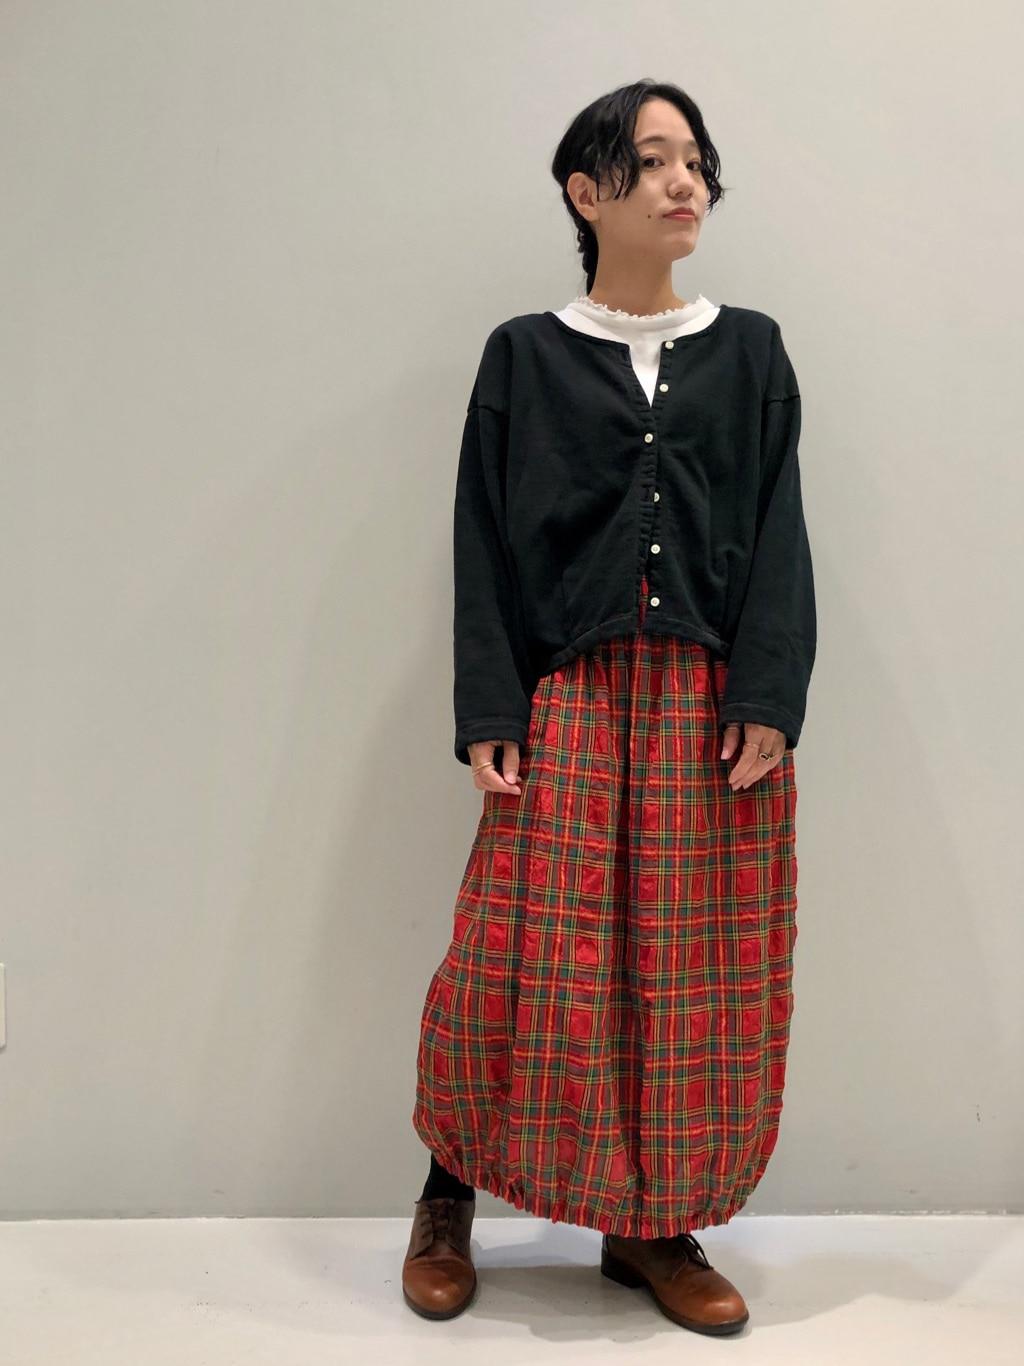 bulle de savon なんばシティ 身長:148cm 2020.09.28